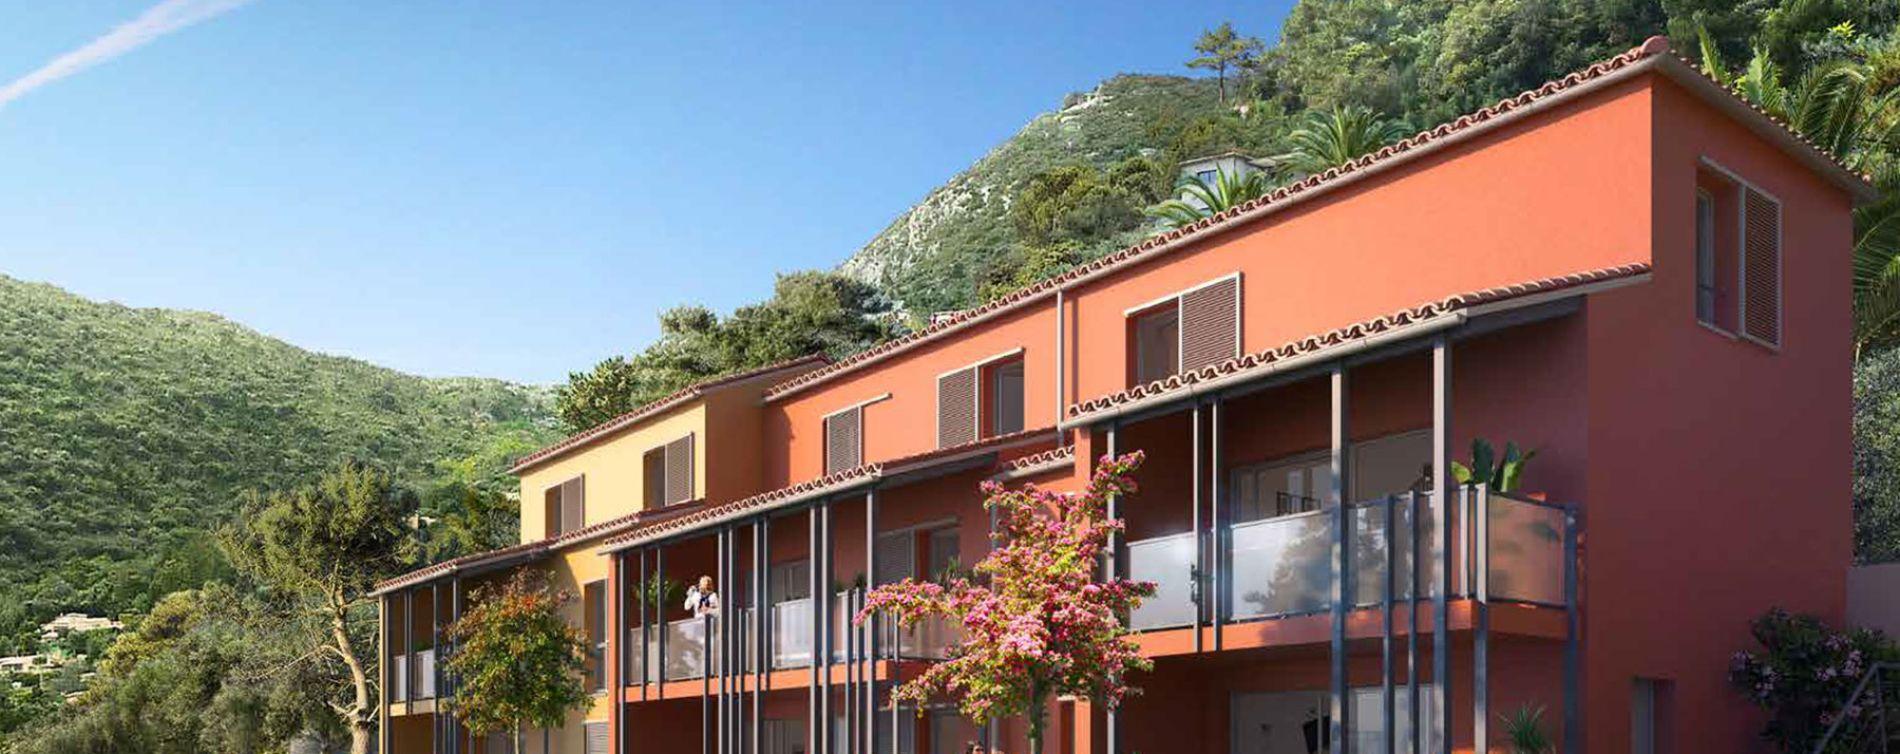 Résidence Alta Riva à Falicon